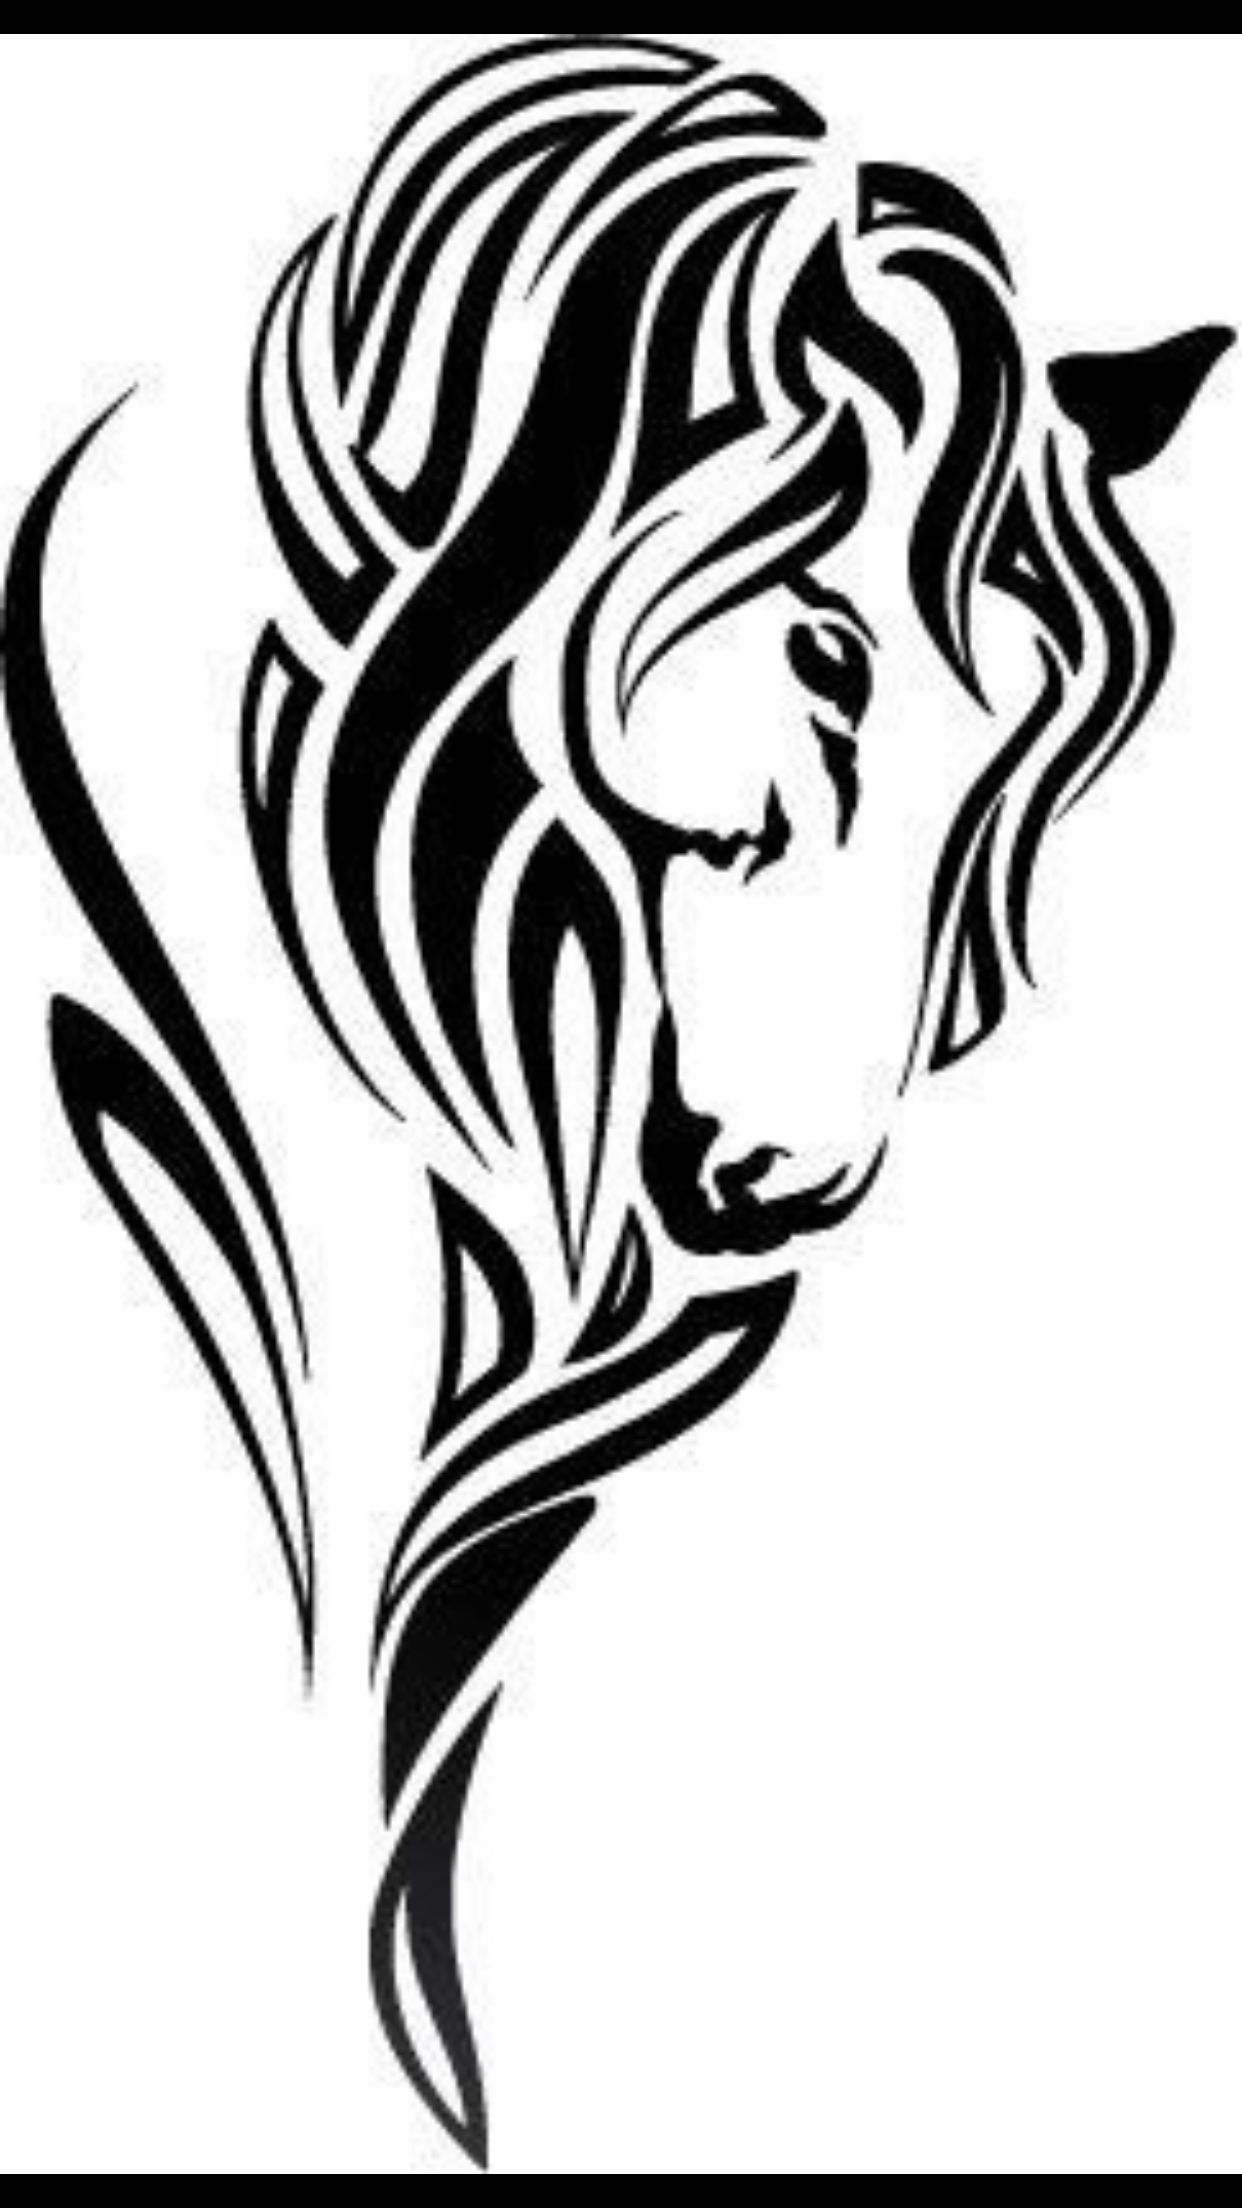 Horse Tattoo Tribal Style   Imágenes Bonitas   Pinterest   Horses in horses stencils